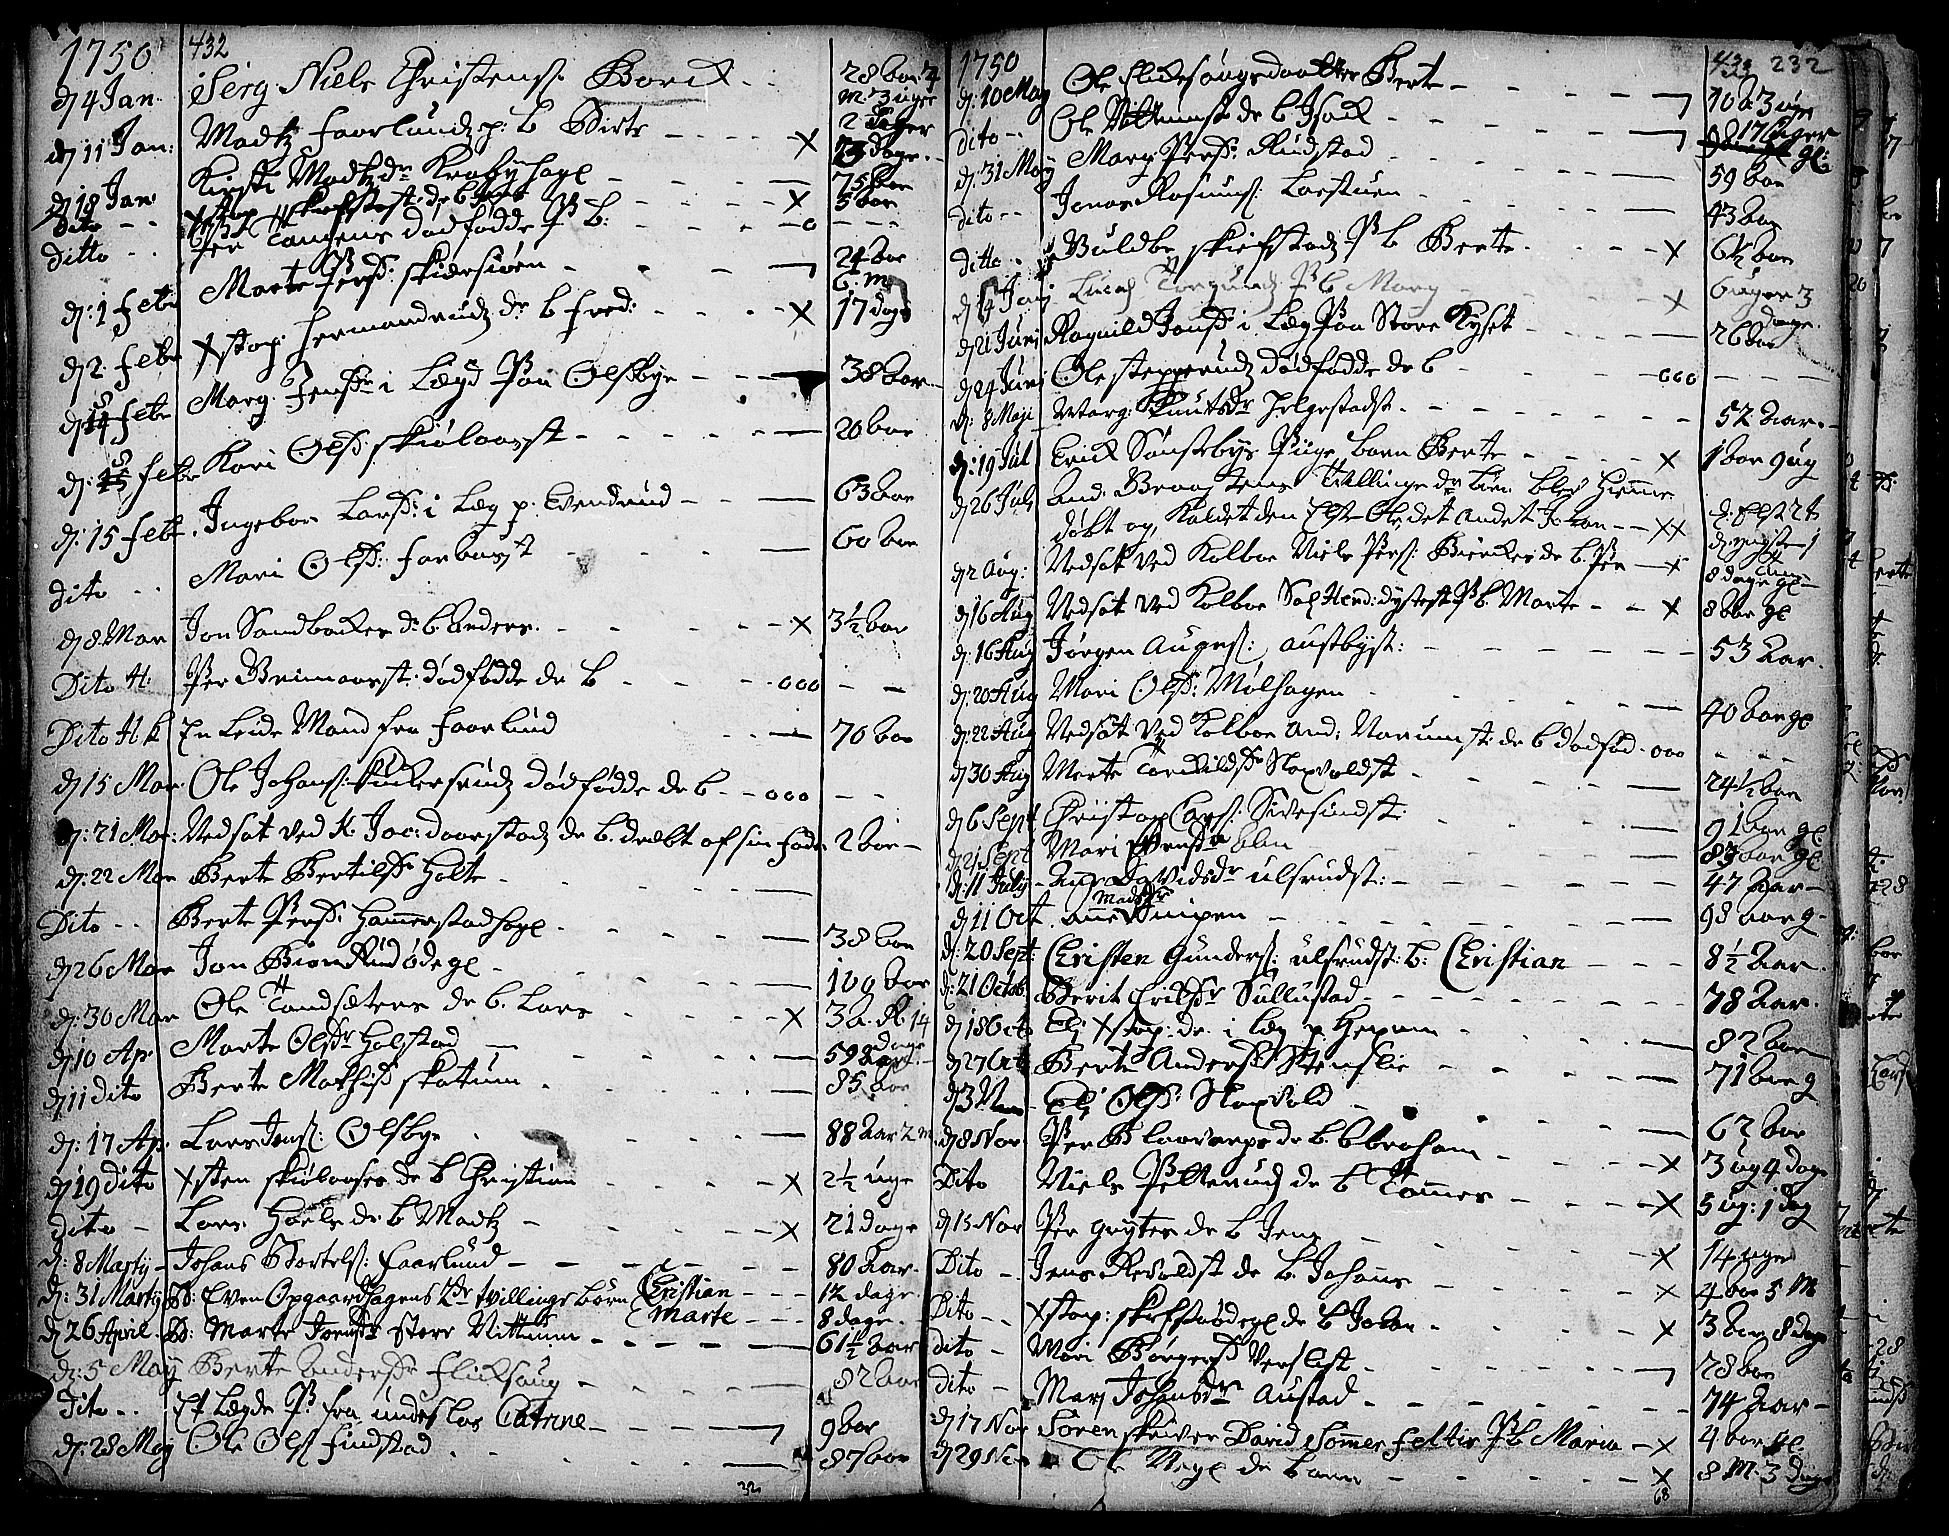 SAH, Toten prestekontor, Ministerialbok nr. 3, 1734-1751, s. 432-433